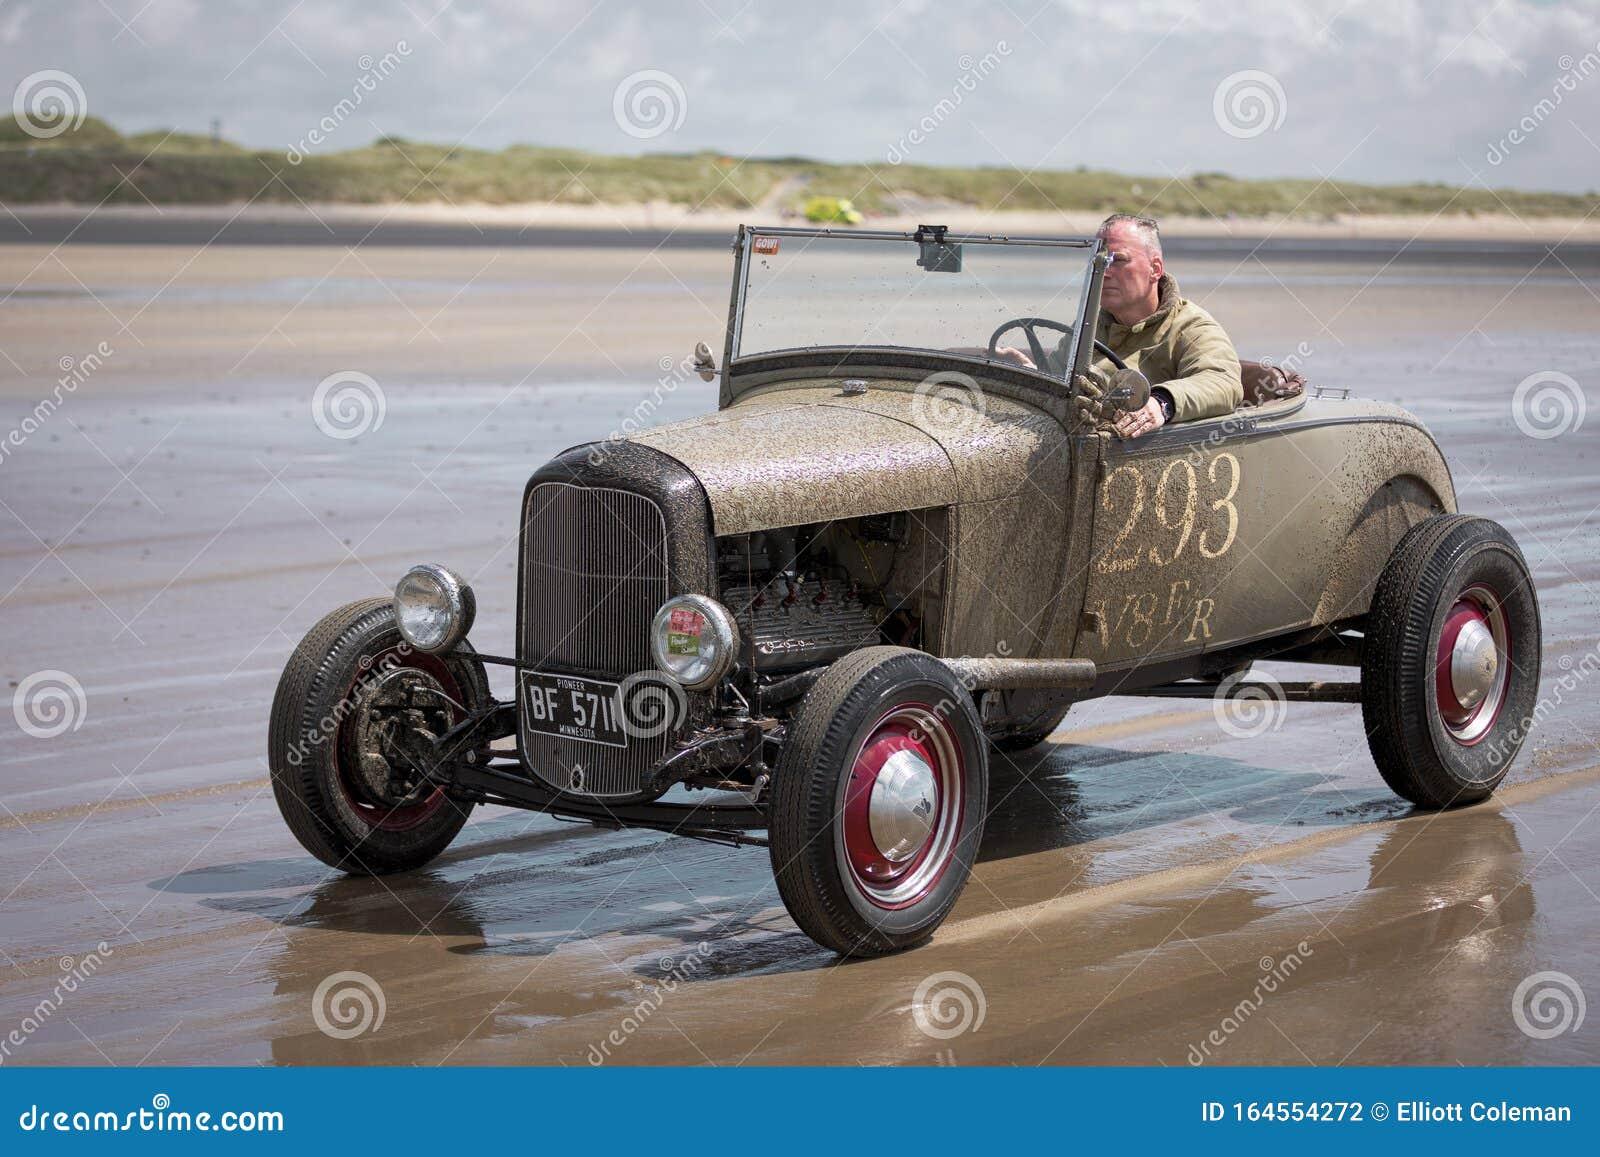 Hot Rod Races - Hot Rod Mit Minnesota Anmeldung Am Strand